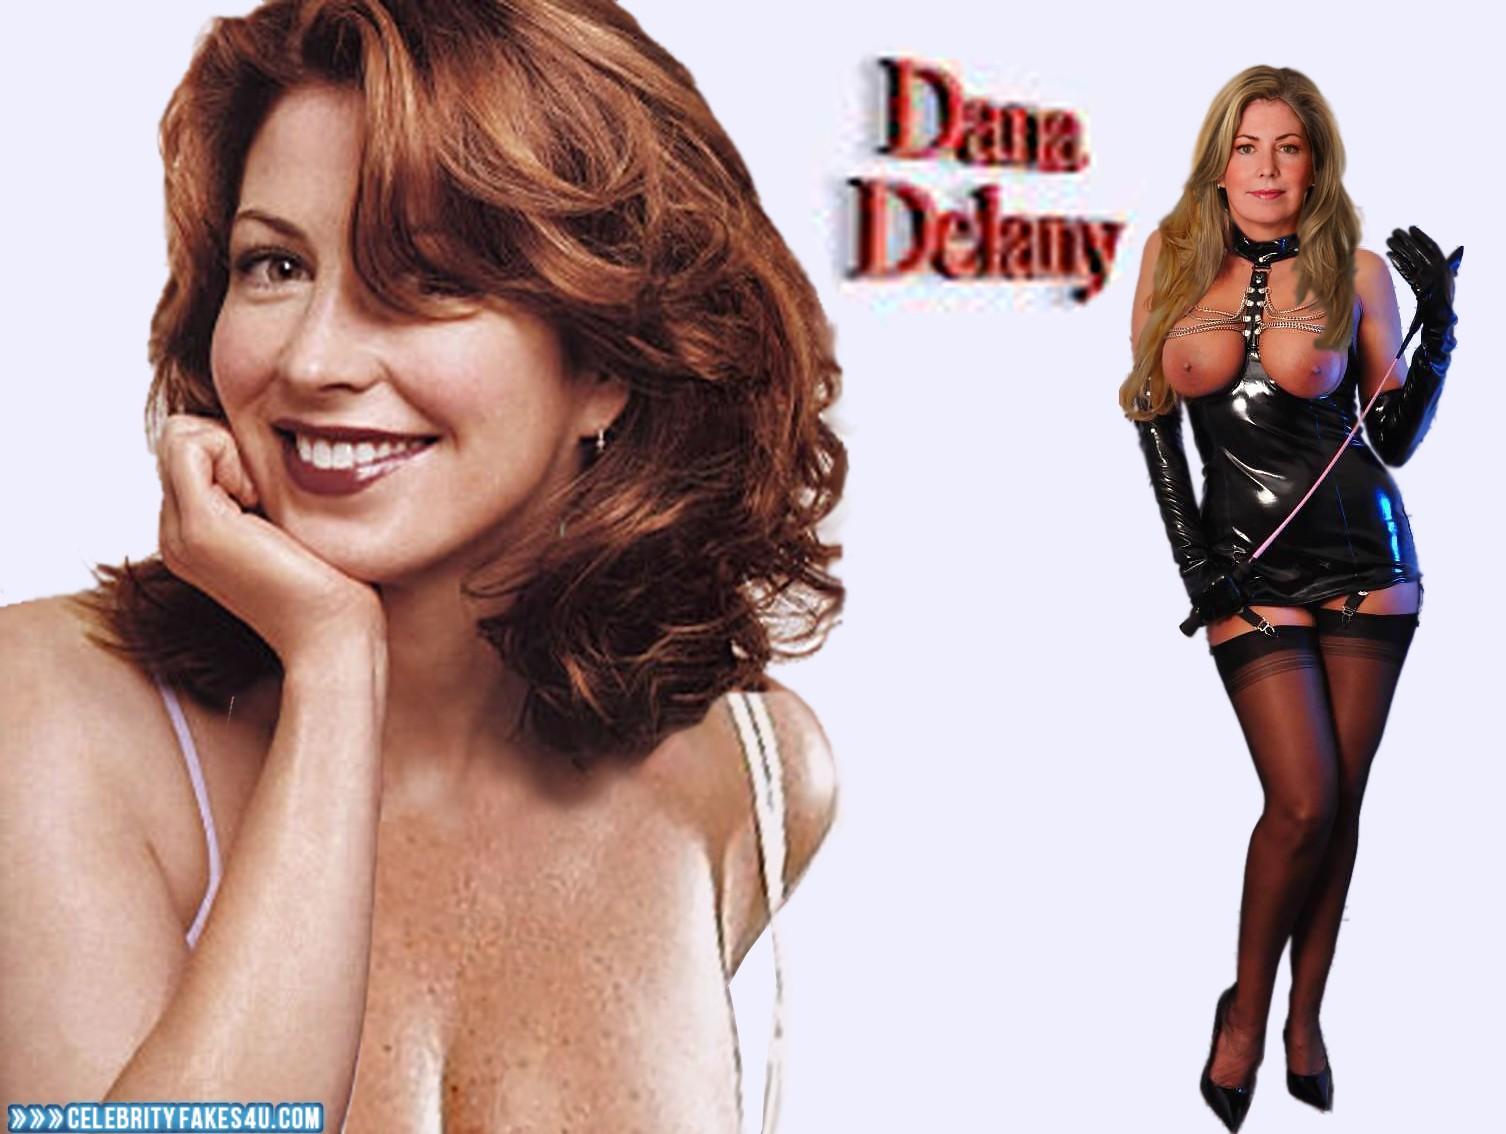 Dana Delany Fake, BDSM, Dominatrix, Latex, Lingerie, Nude, Stockings, Tits, Porn